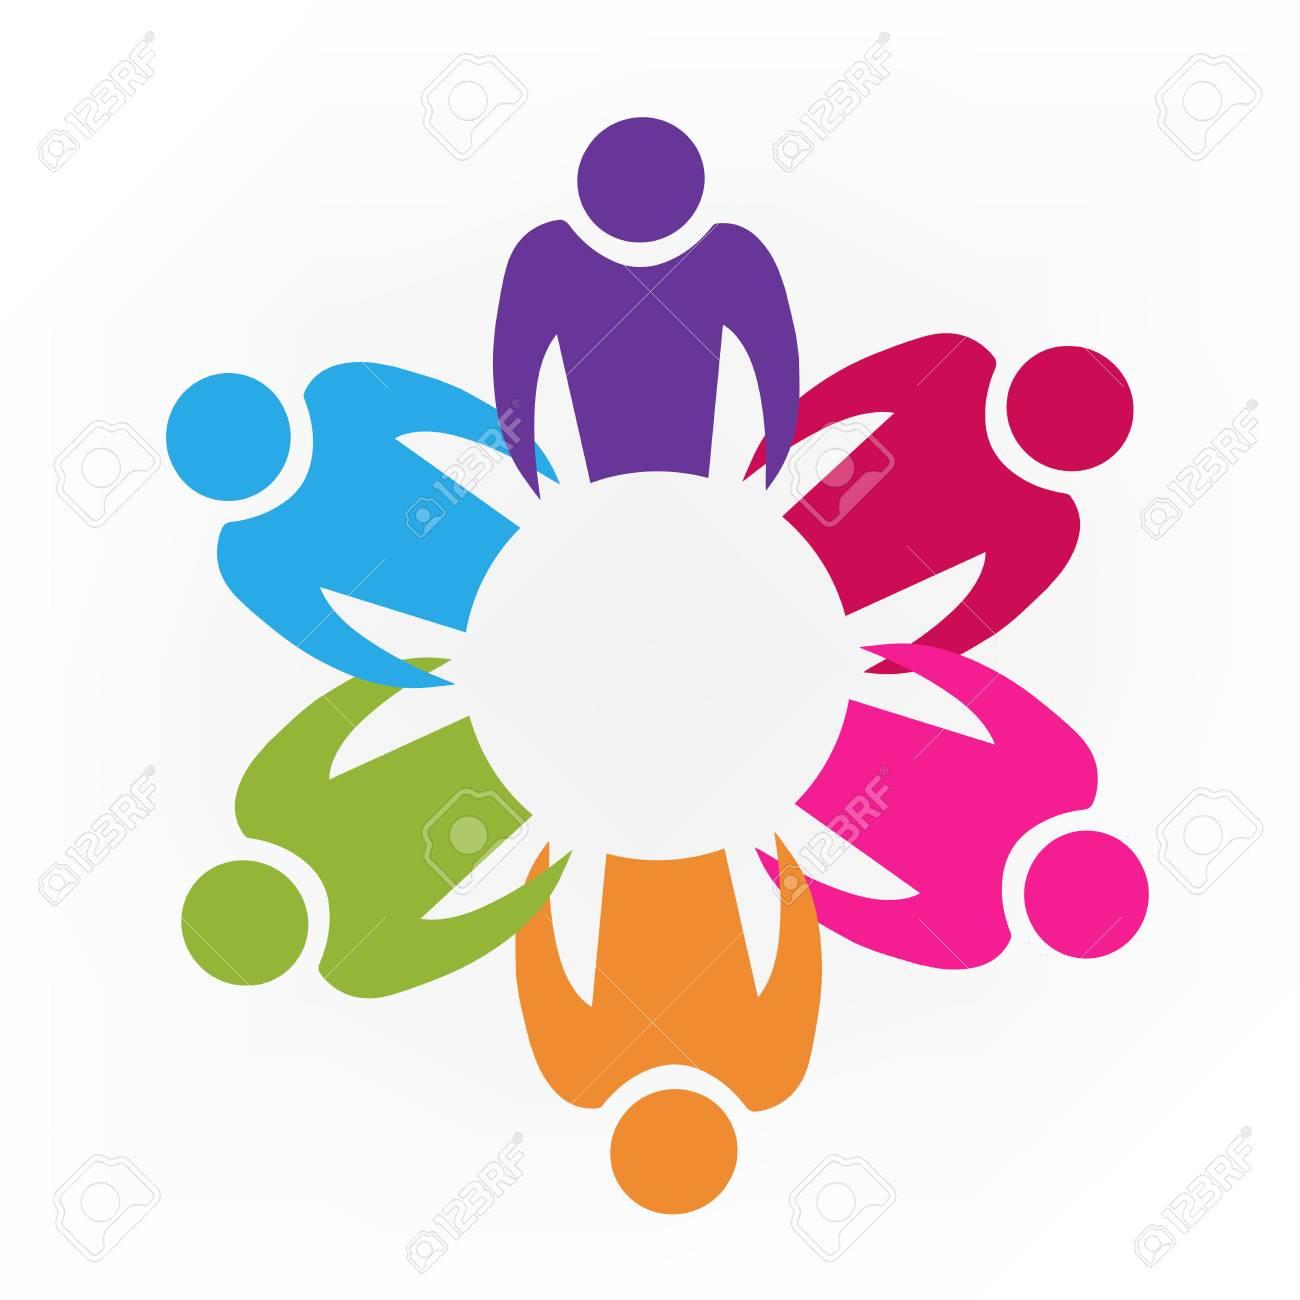 Teamwork unity people id cards logo icon - 97686456